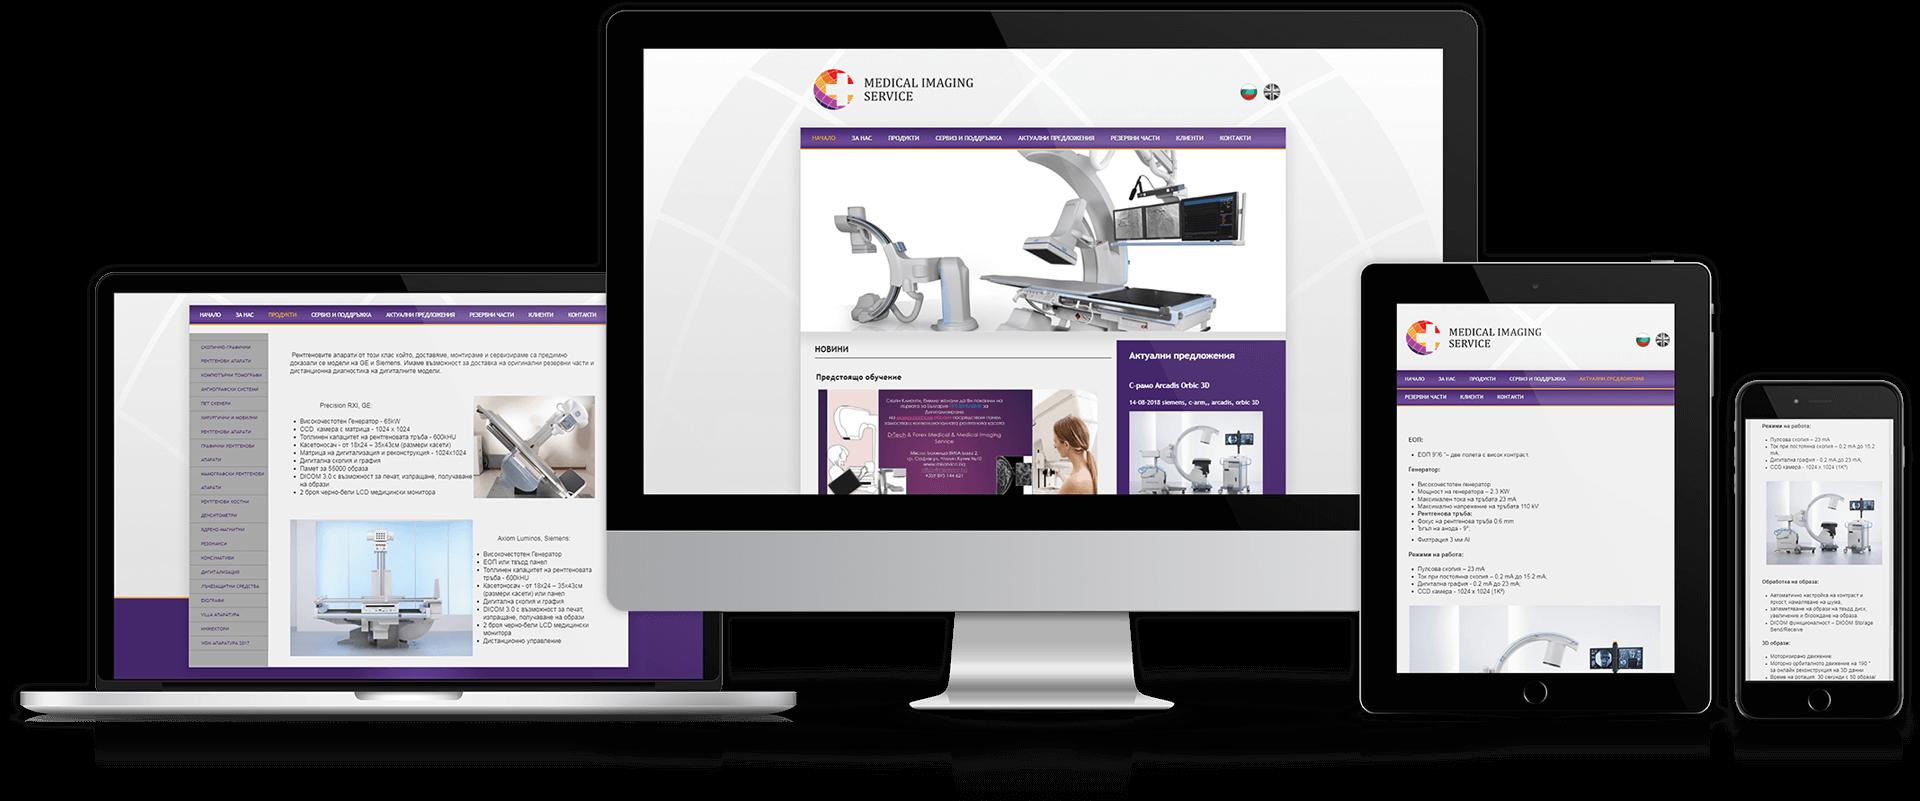 Medical Imaging Service